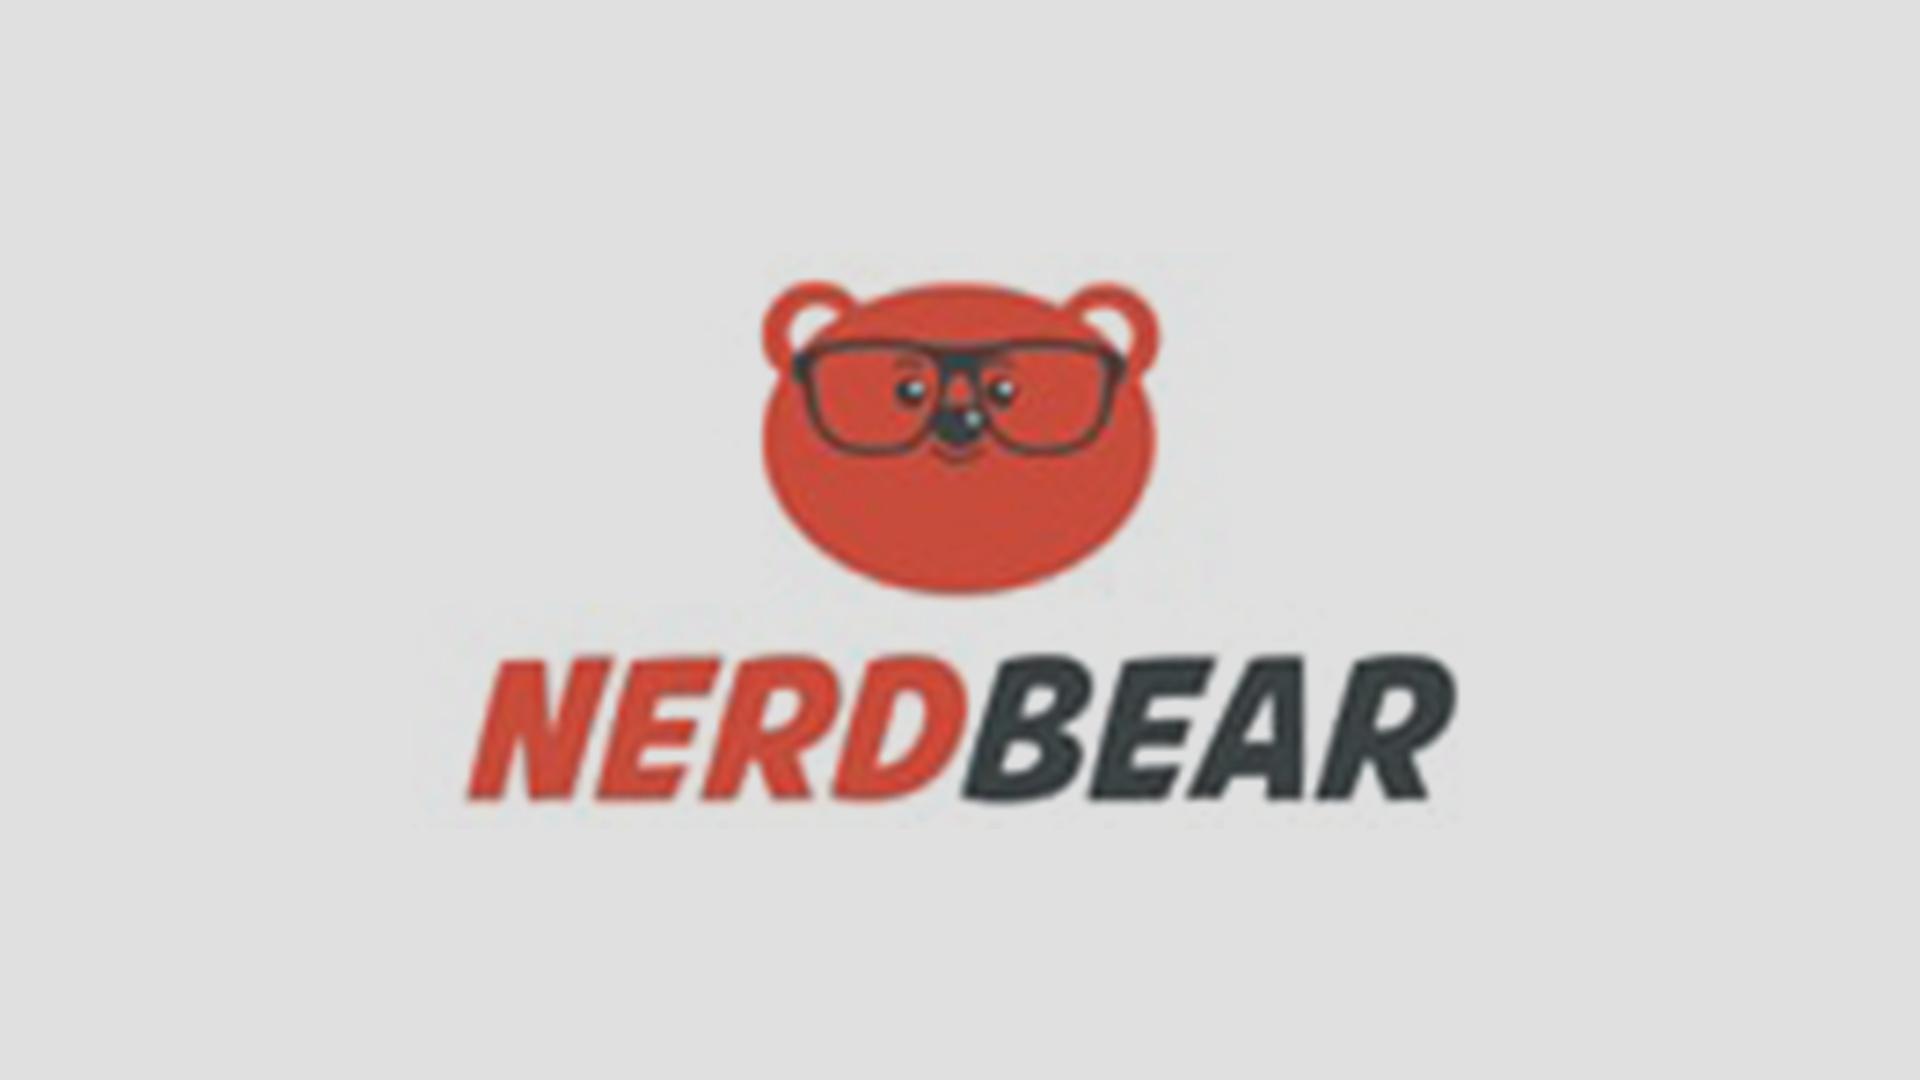 nerd-bear-logo